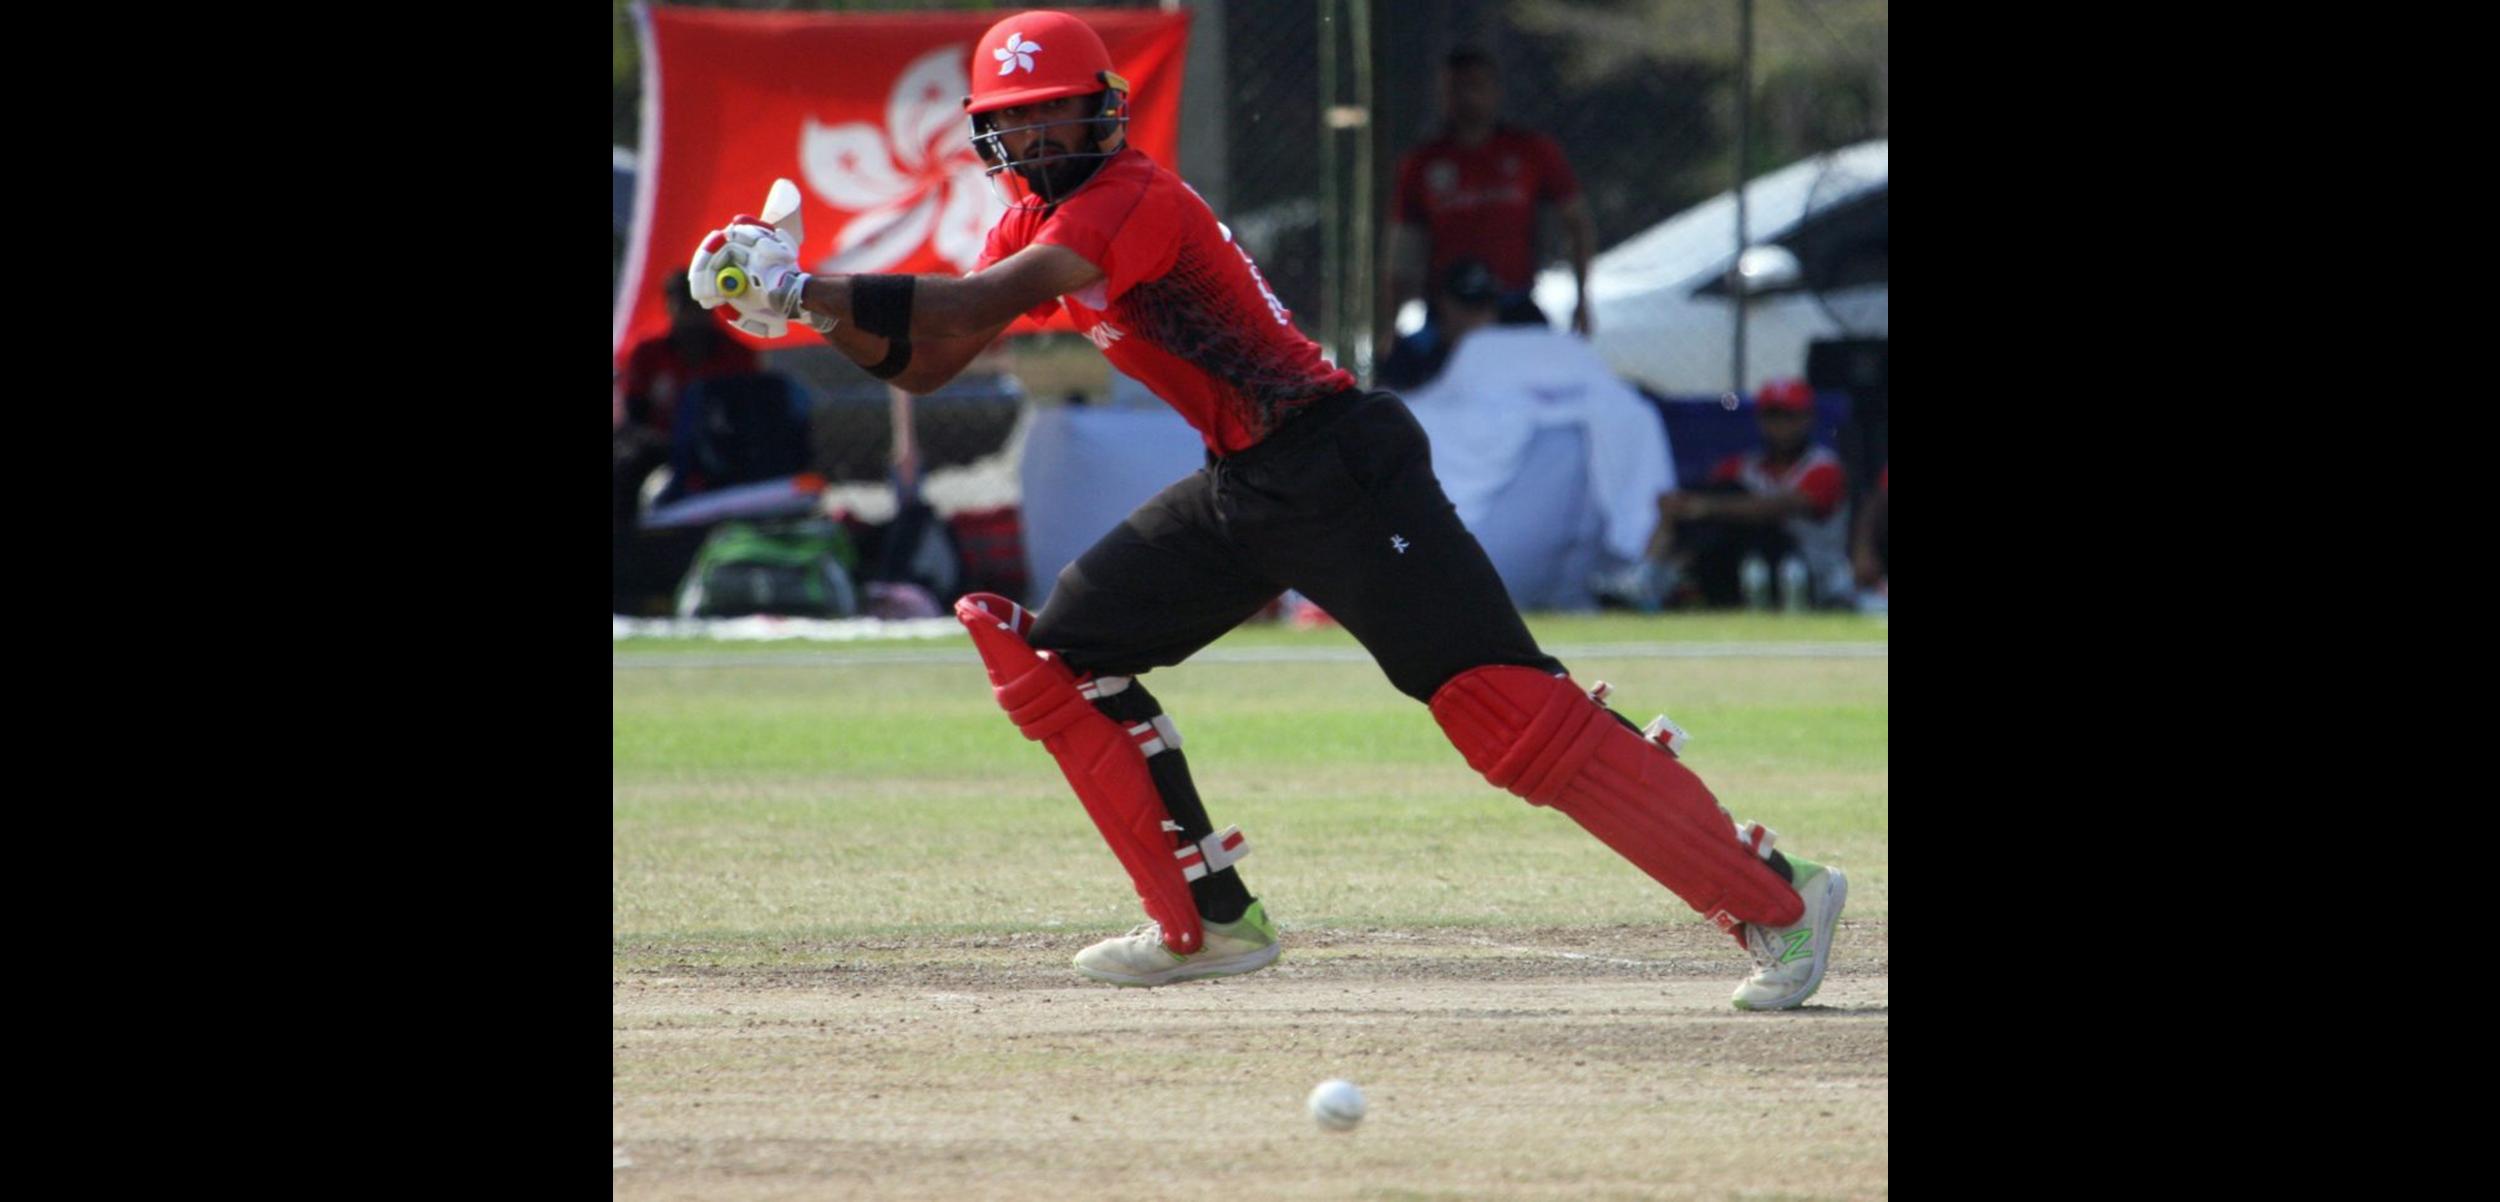 Cricket Hong Kong announces Nizakat Khan as the Hong Kong Men's captain